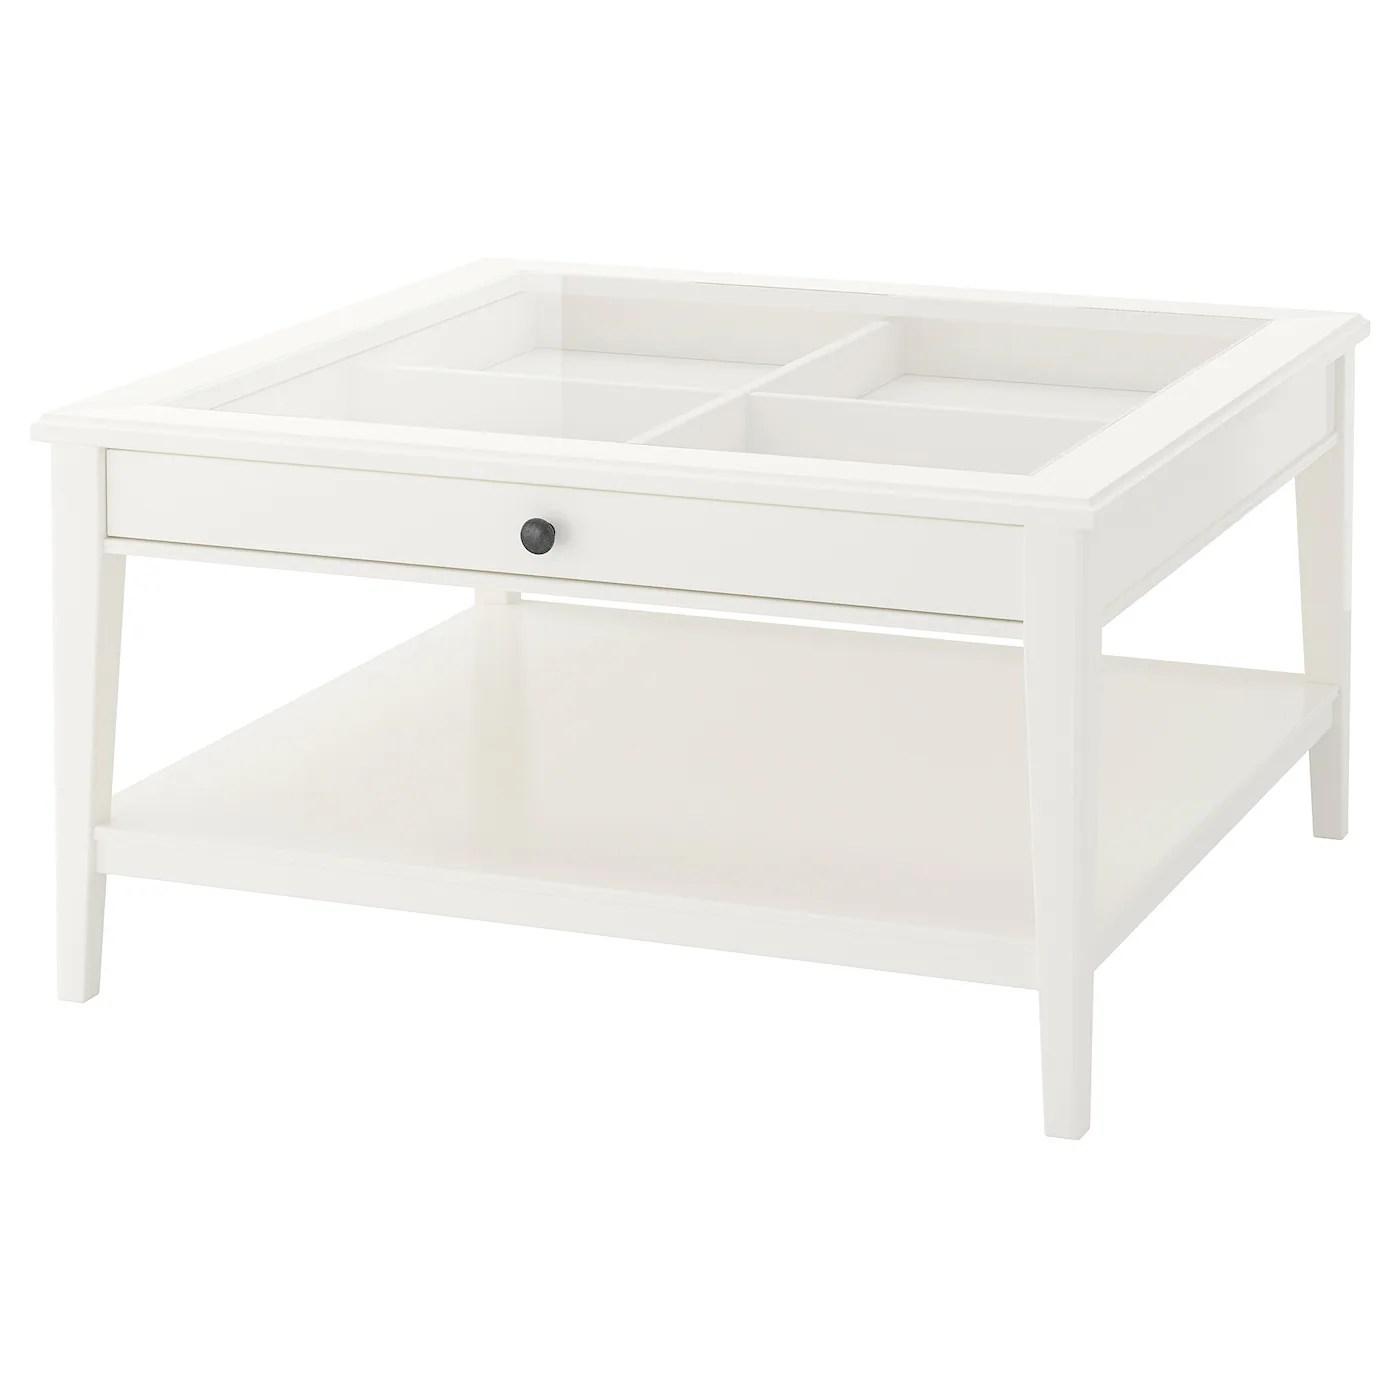 liatorp coffee table white glass 36 5 8x36 5 8